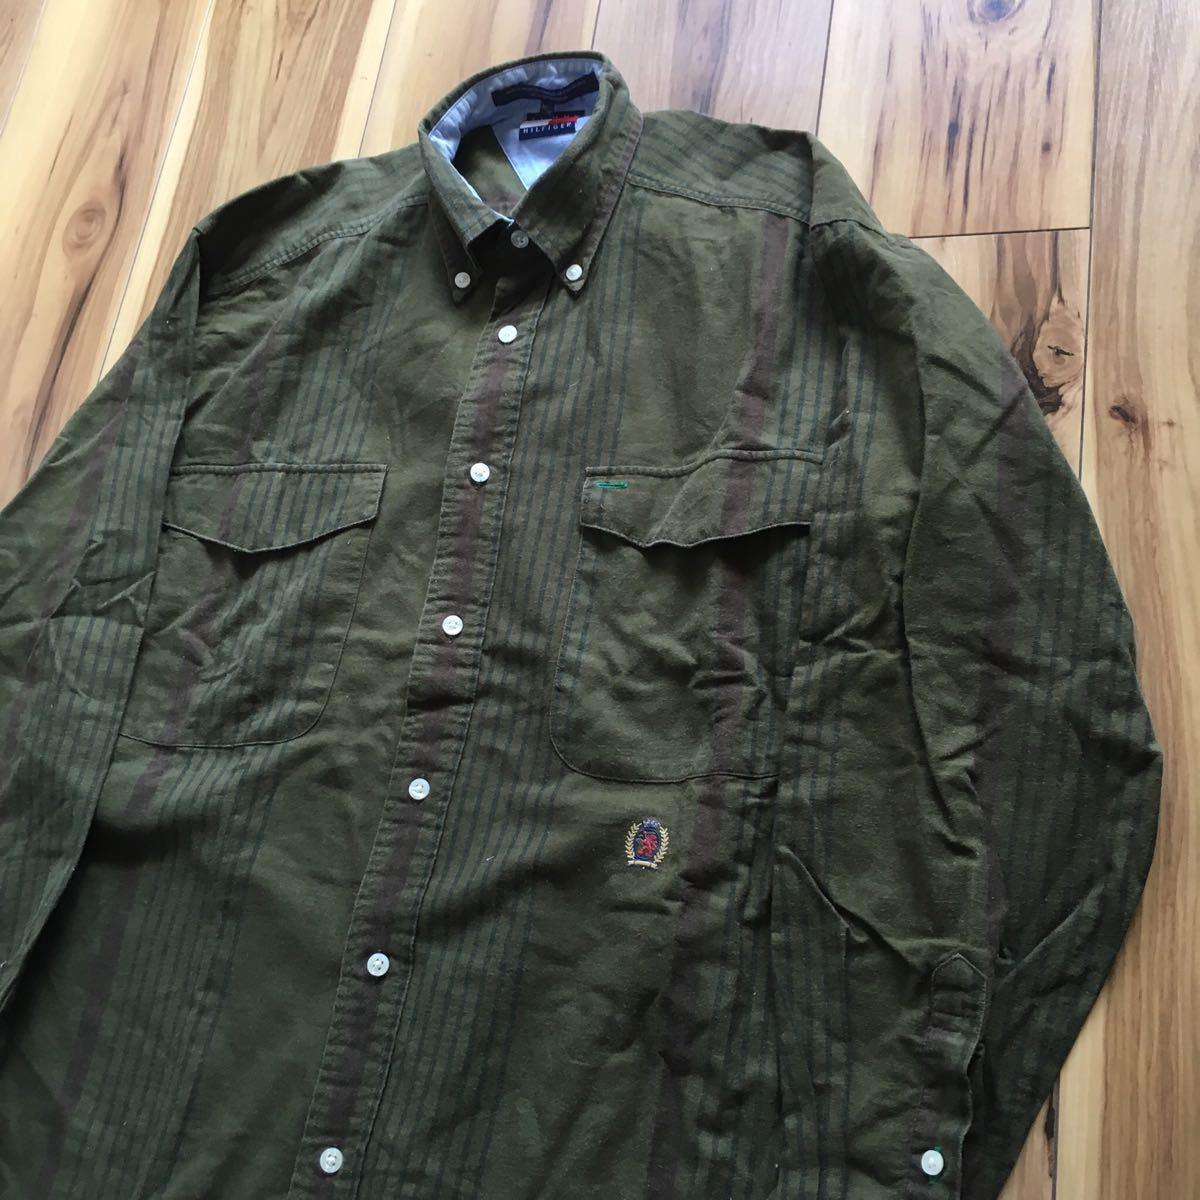 90s TOMMY HILFIGER 長袖シャツ メンズ 実寸 XL程度 カーキ トミーヒルフィガー BDシャツ ヴィンテージ ビンテージ 古着 ビッグサイズ B316_画像2